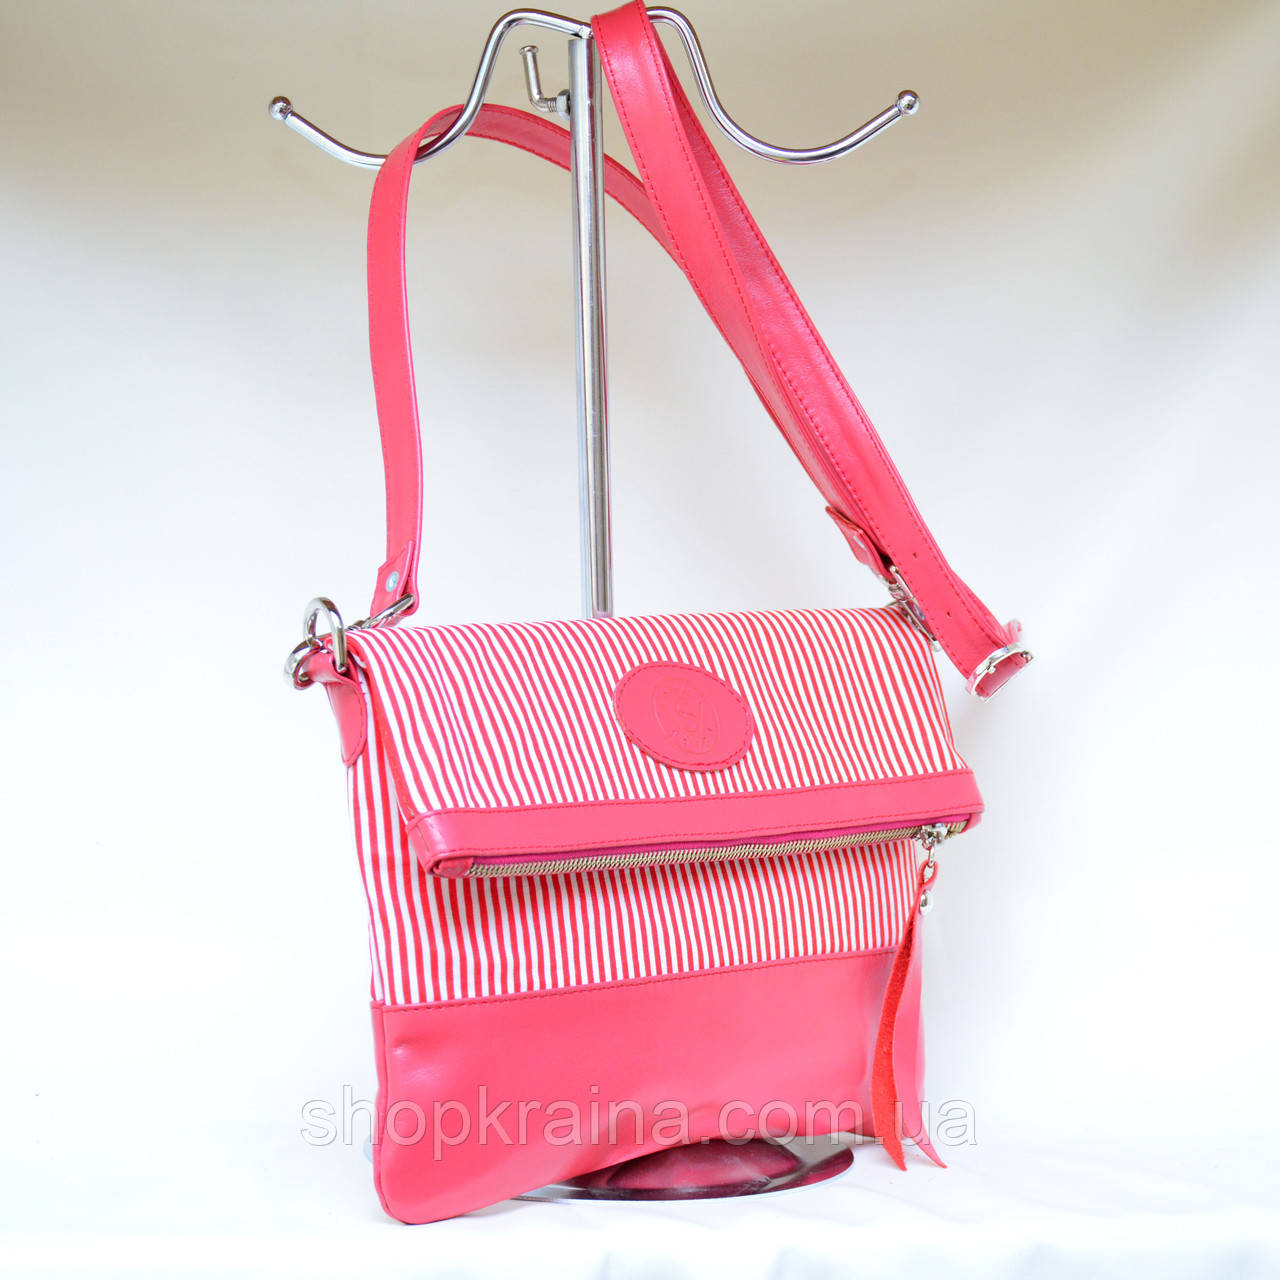 Кожаный клатч VS131 pink stripes 28х20 см